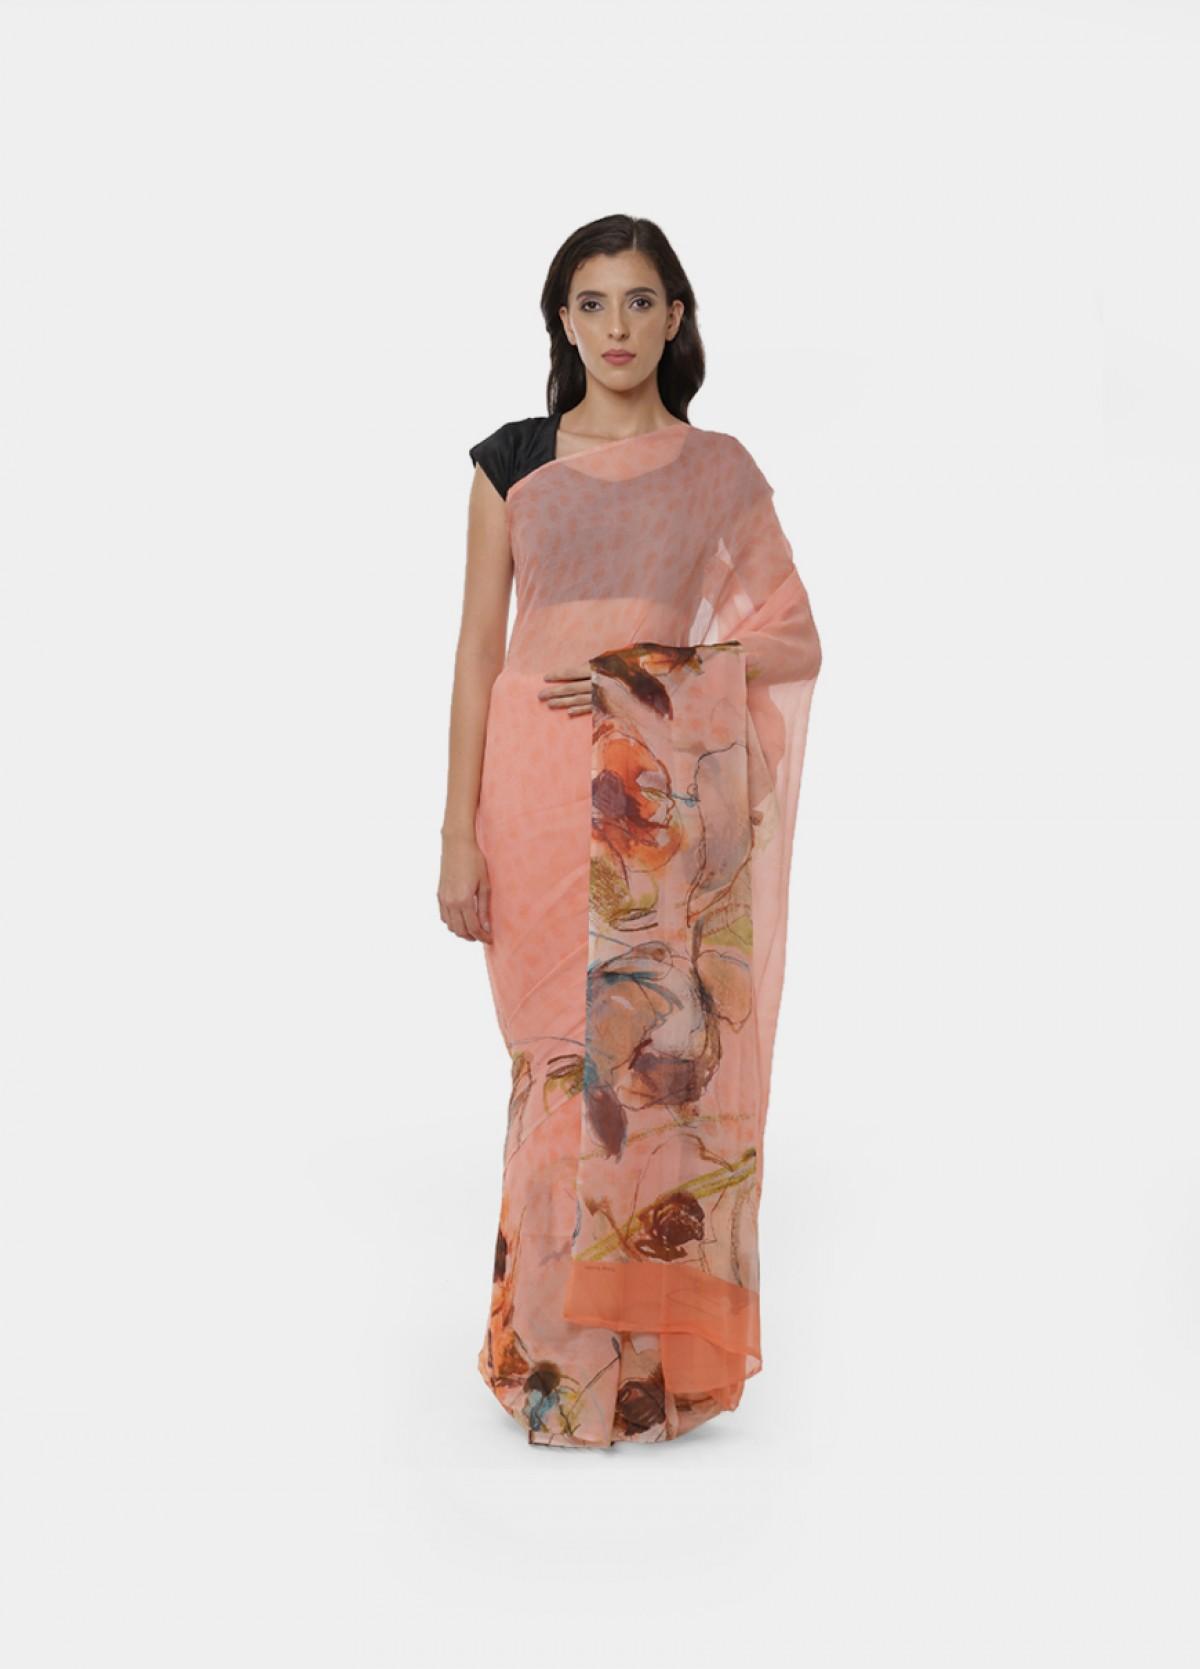 The Silk Chiffon Sari